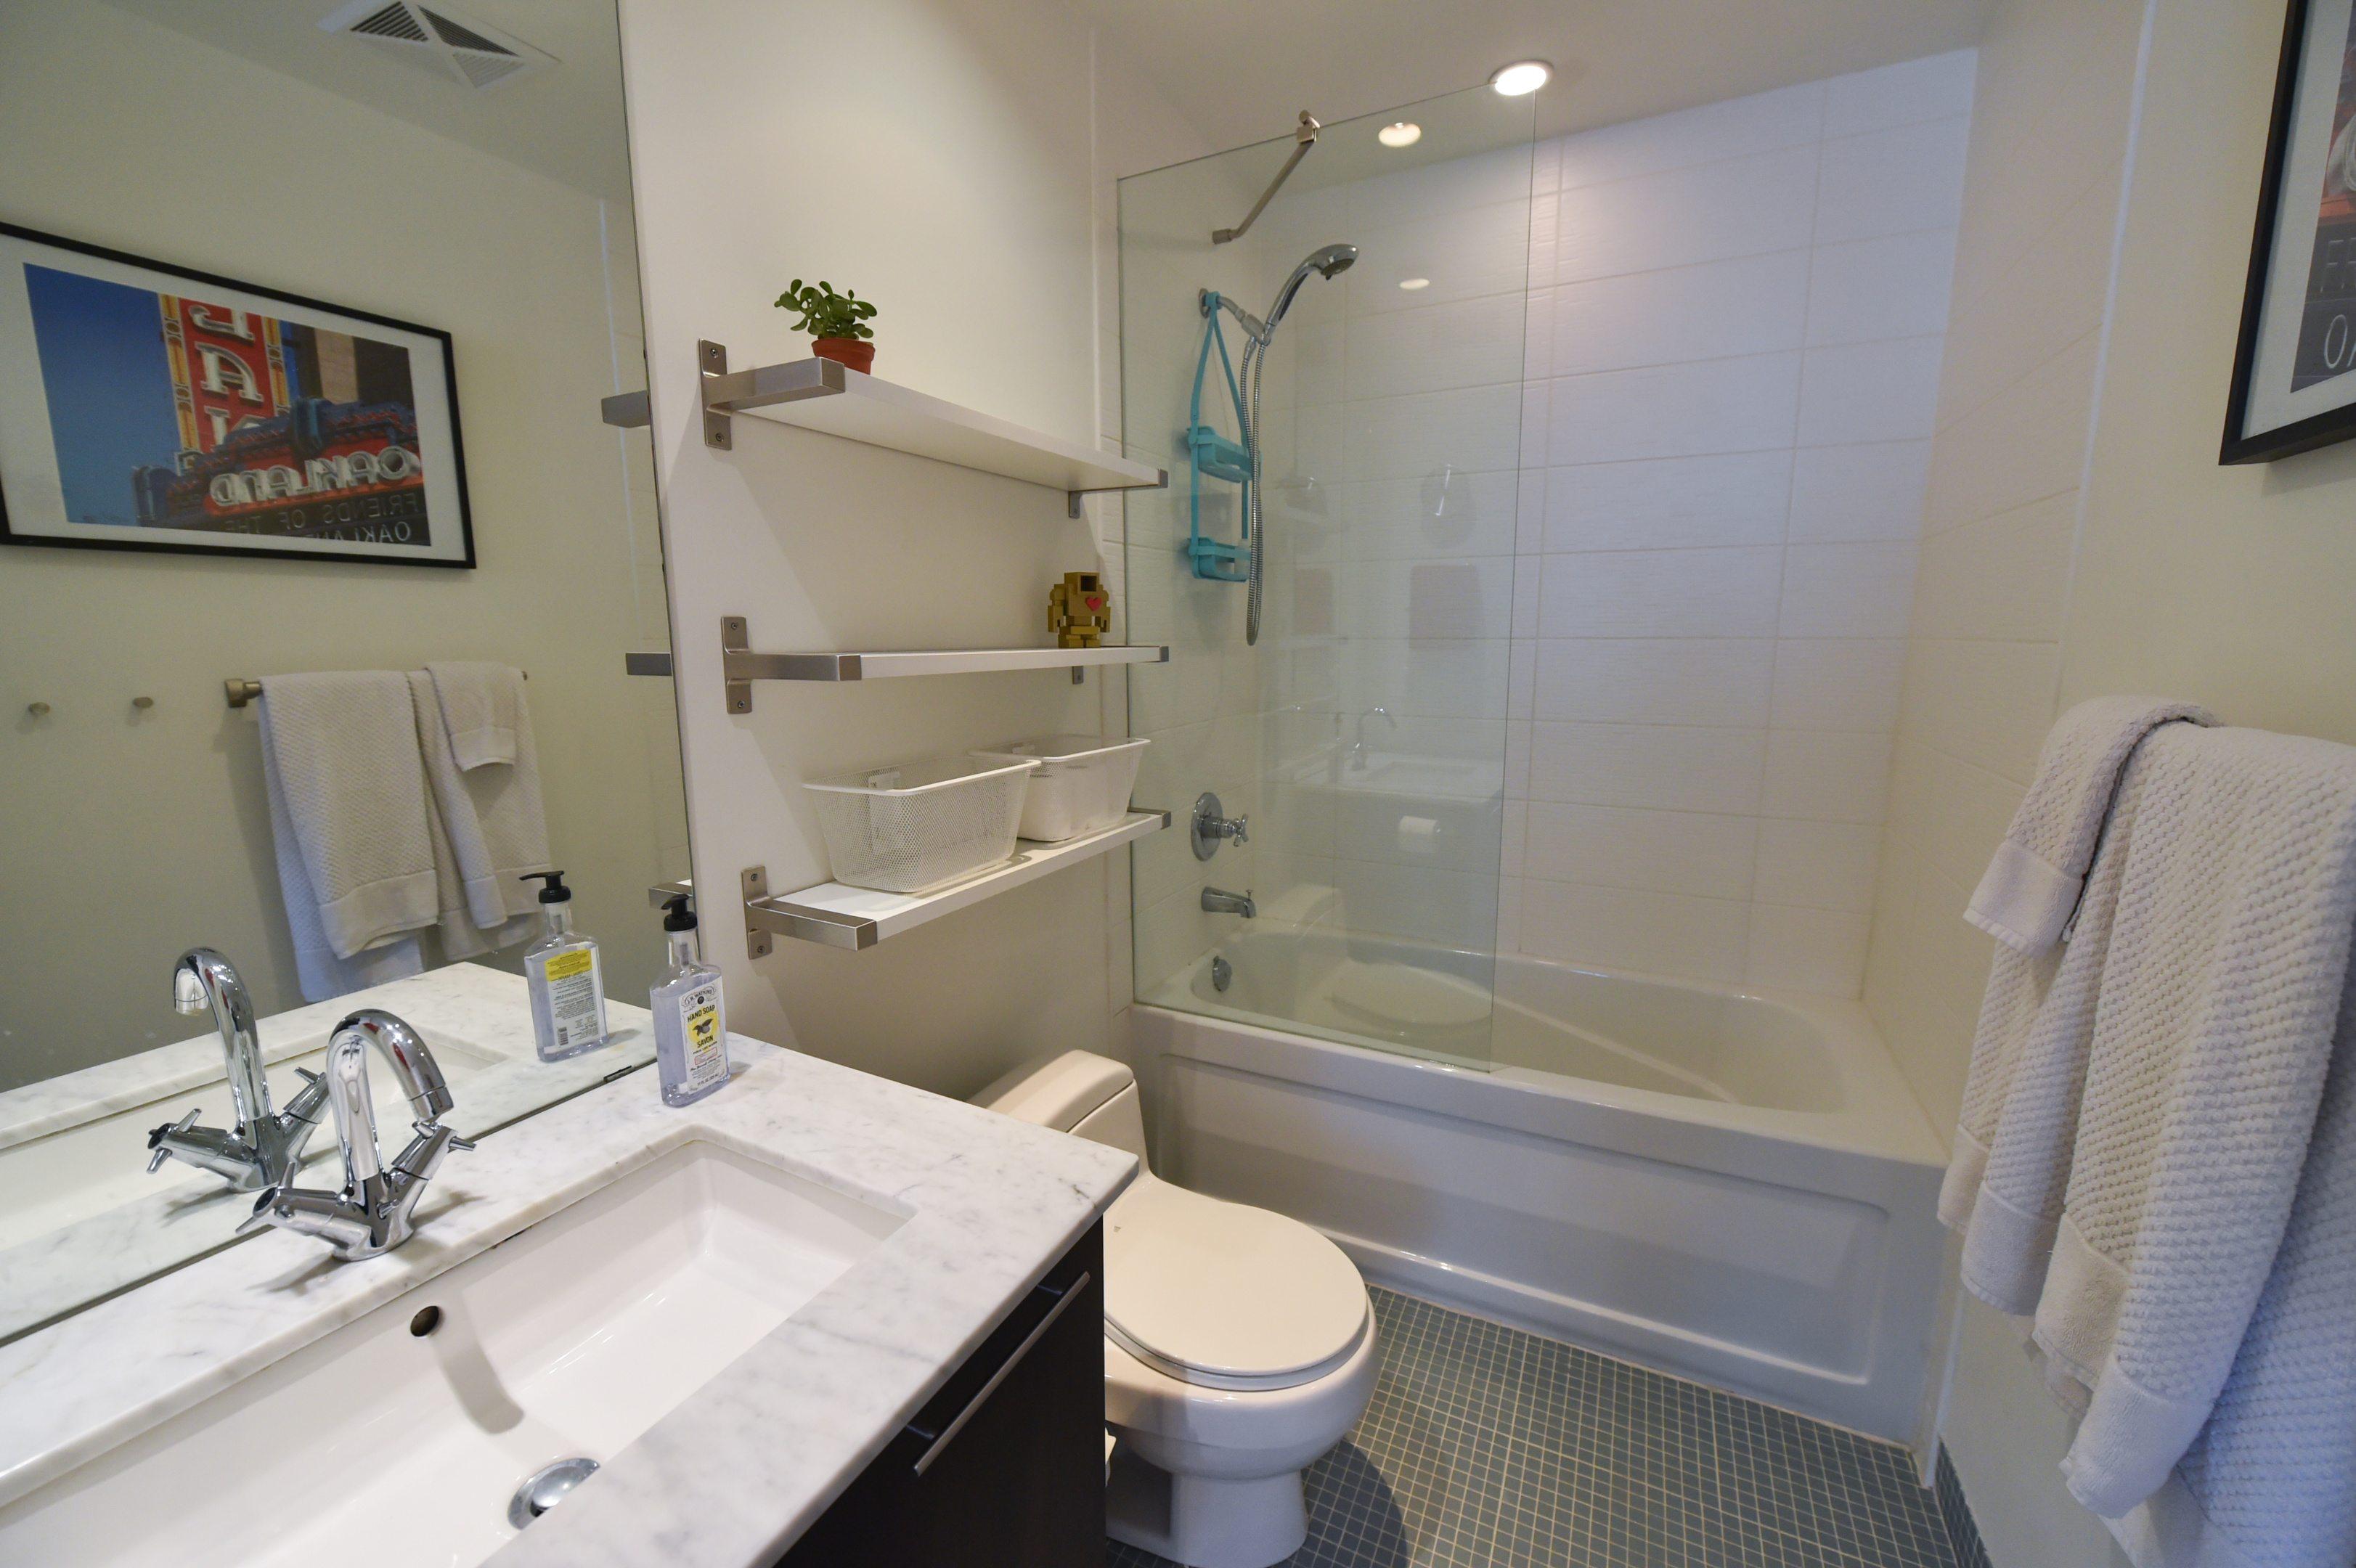 toronto-apartment-for-rent-533-richmond-street-west-5